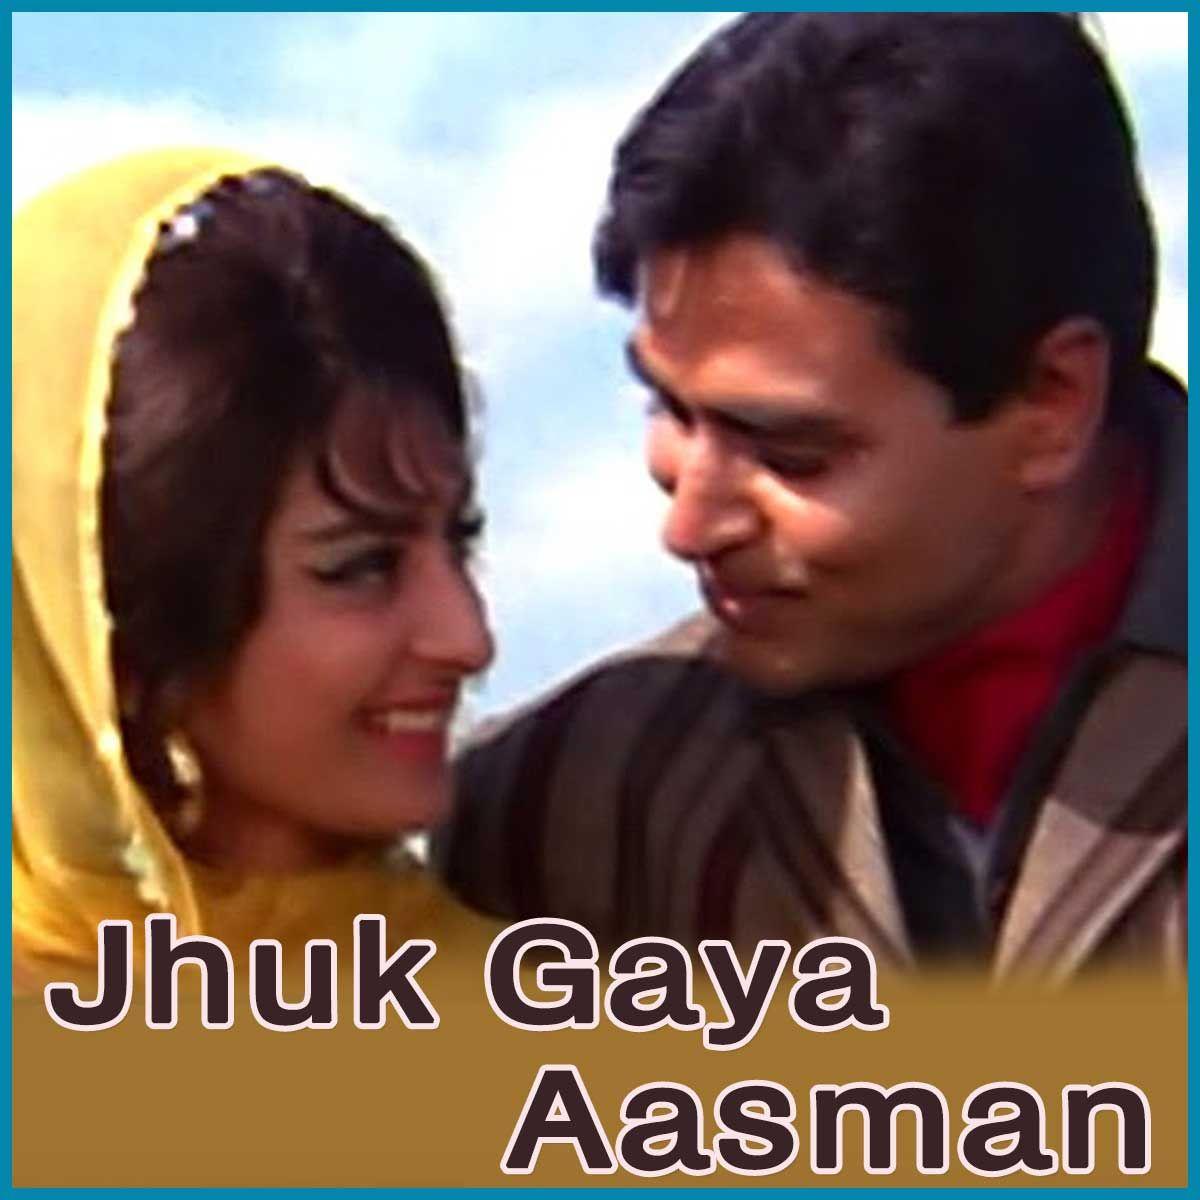 Jhuk Gaya Aasman - Kahan Chal Diye Video Song